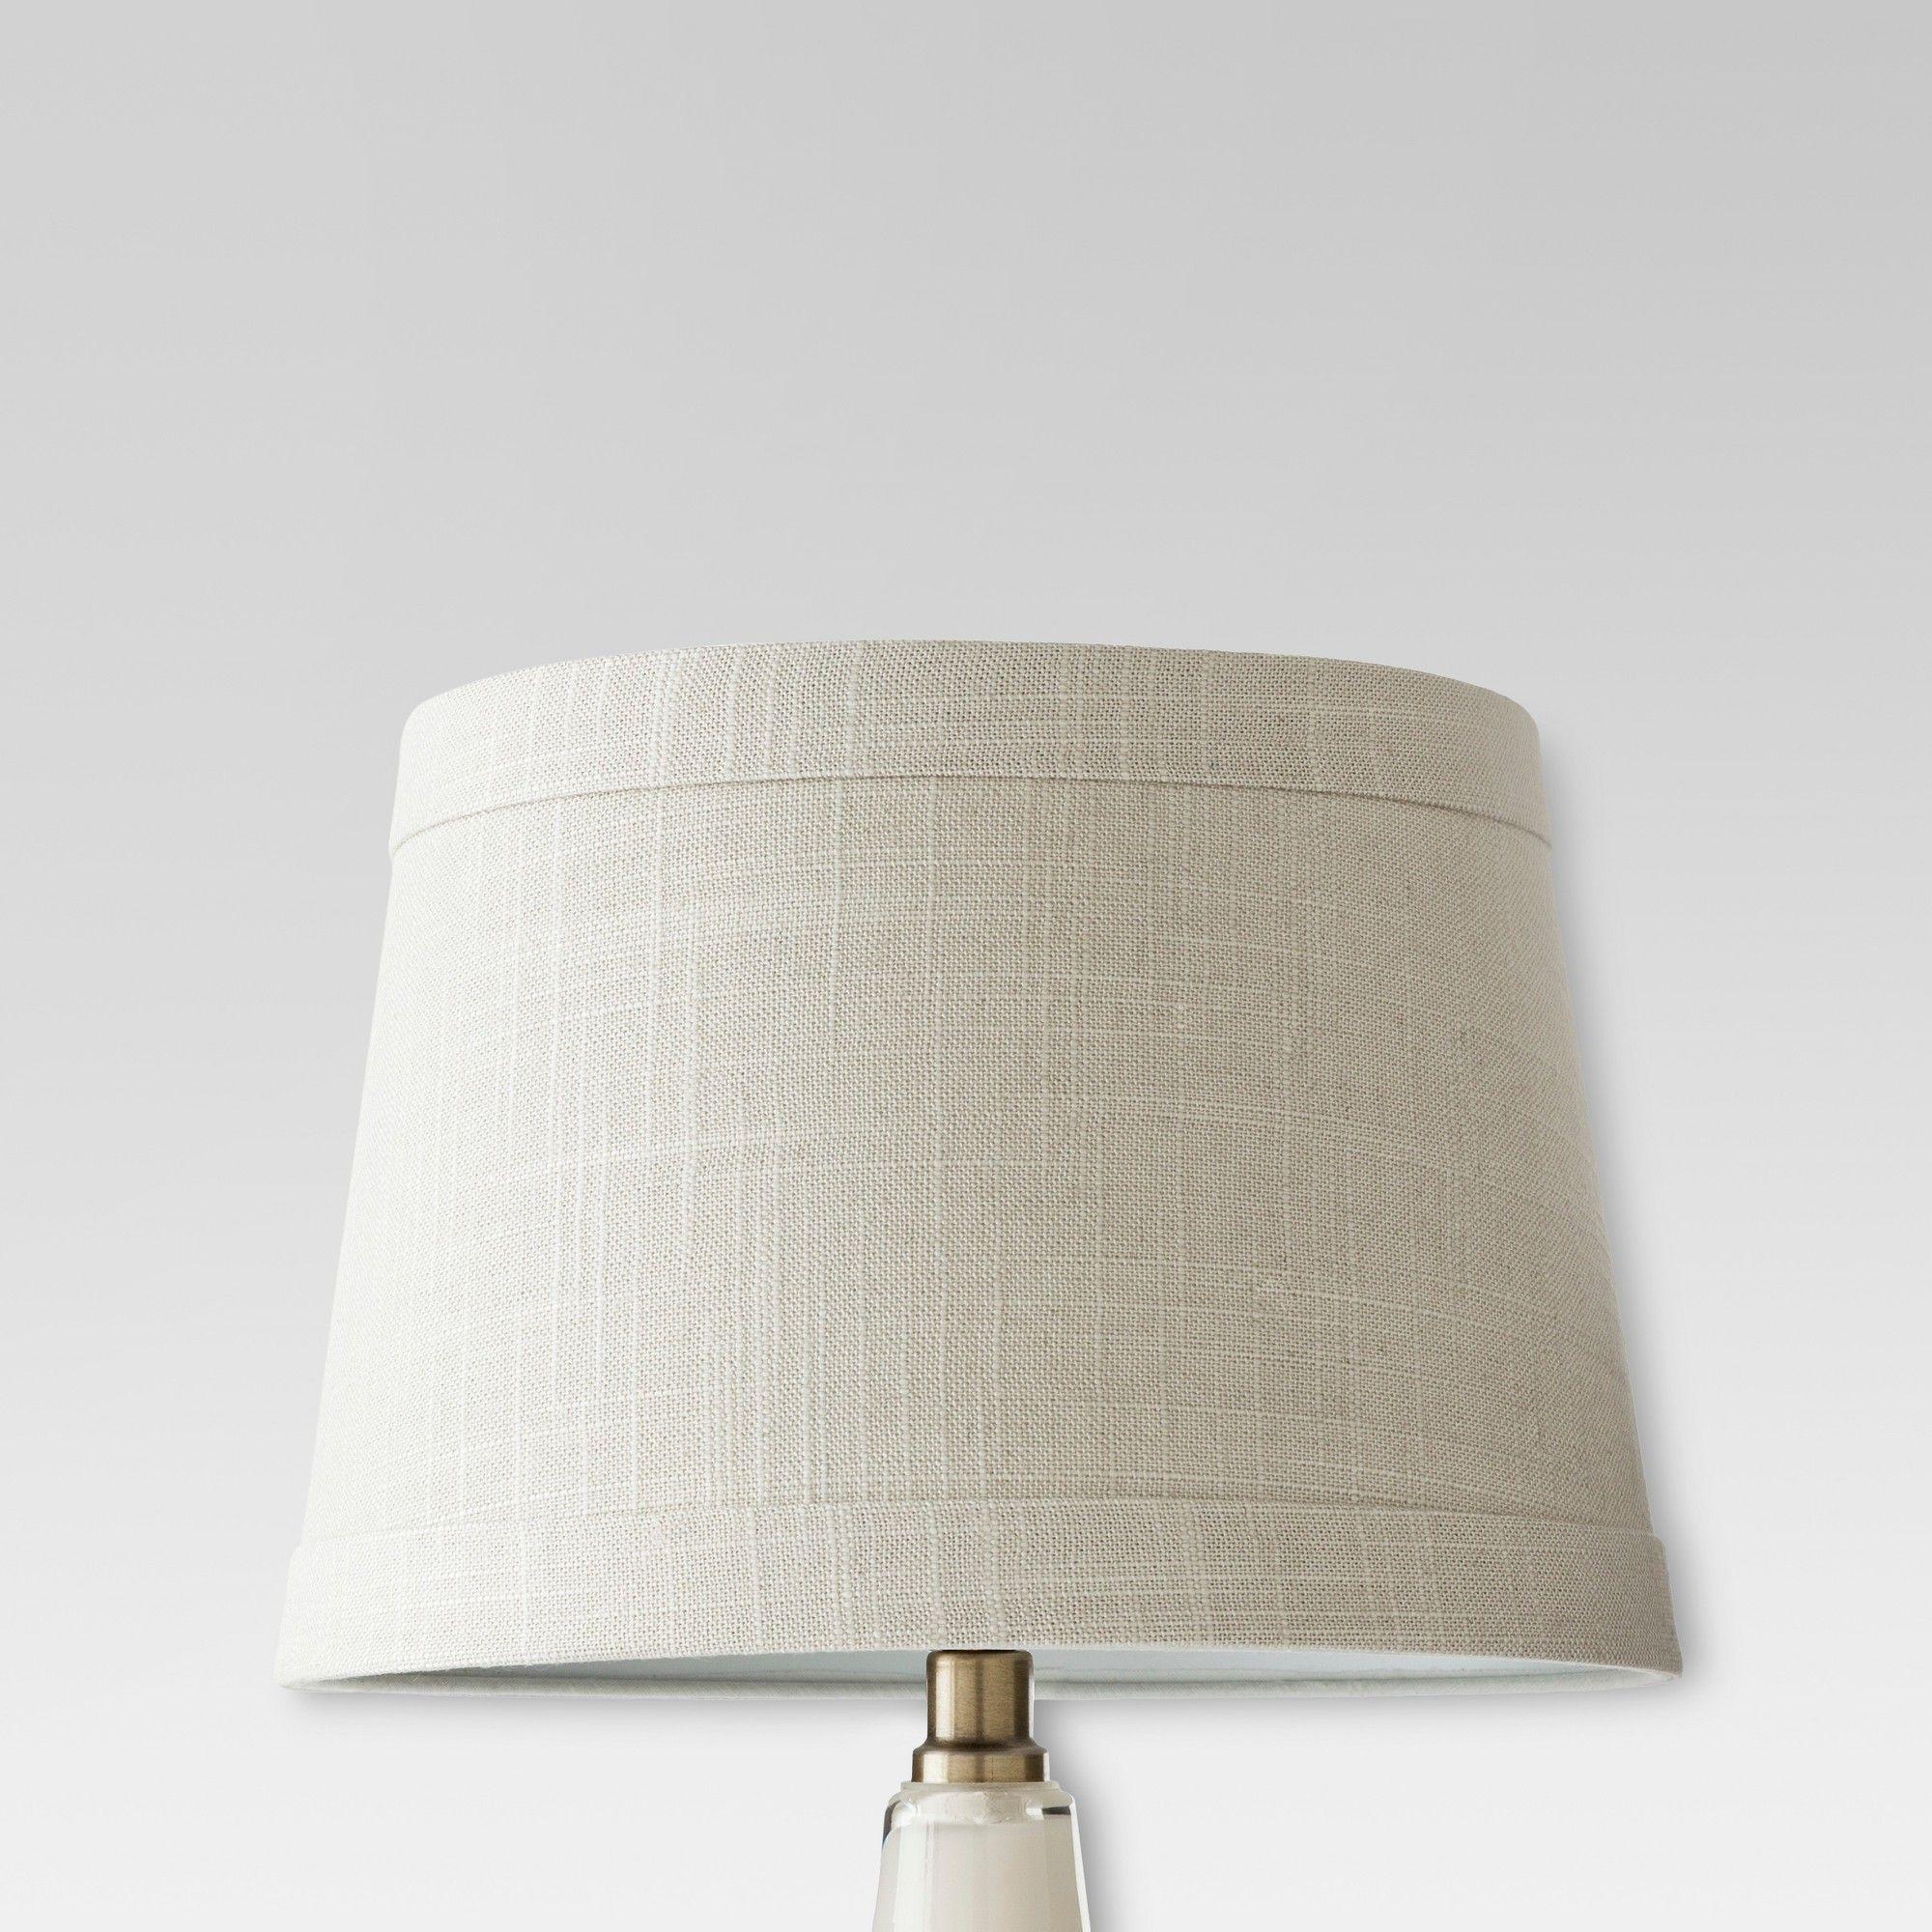 5 Wonderful Tips Lamp Shades Living Room Colour Colorful Lamp Shades Fun Lamp Shades Industrial House Lamp Shades Lamp Shade Old Lamp Shades